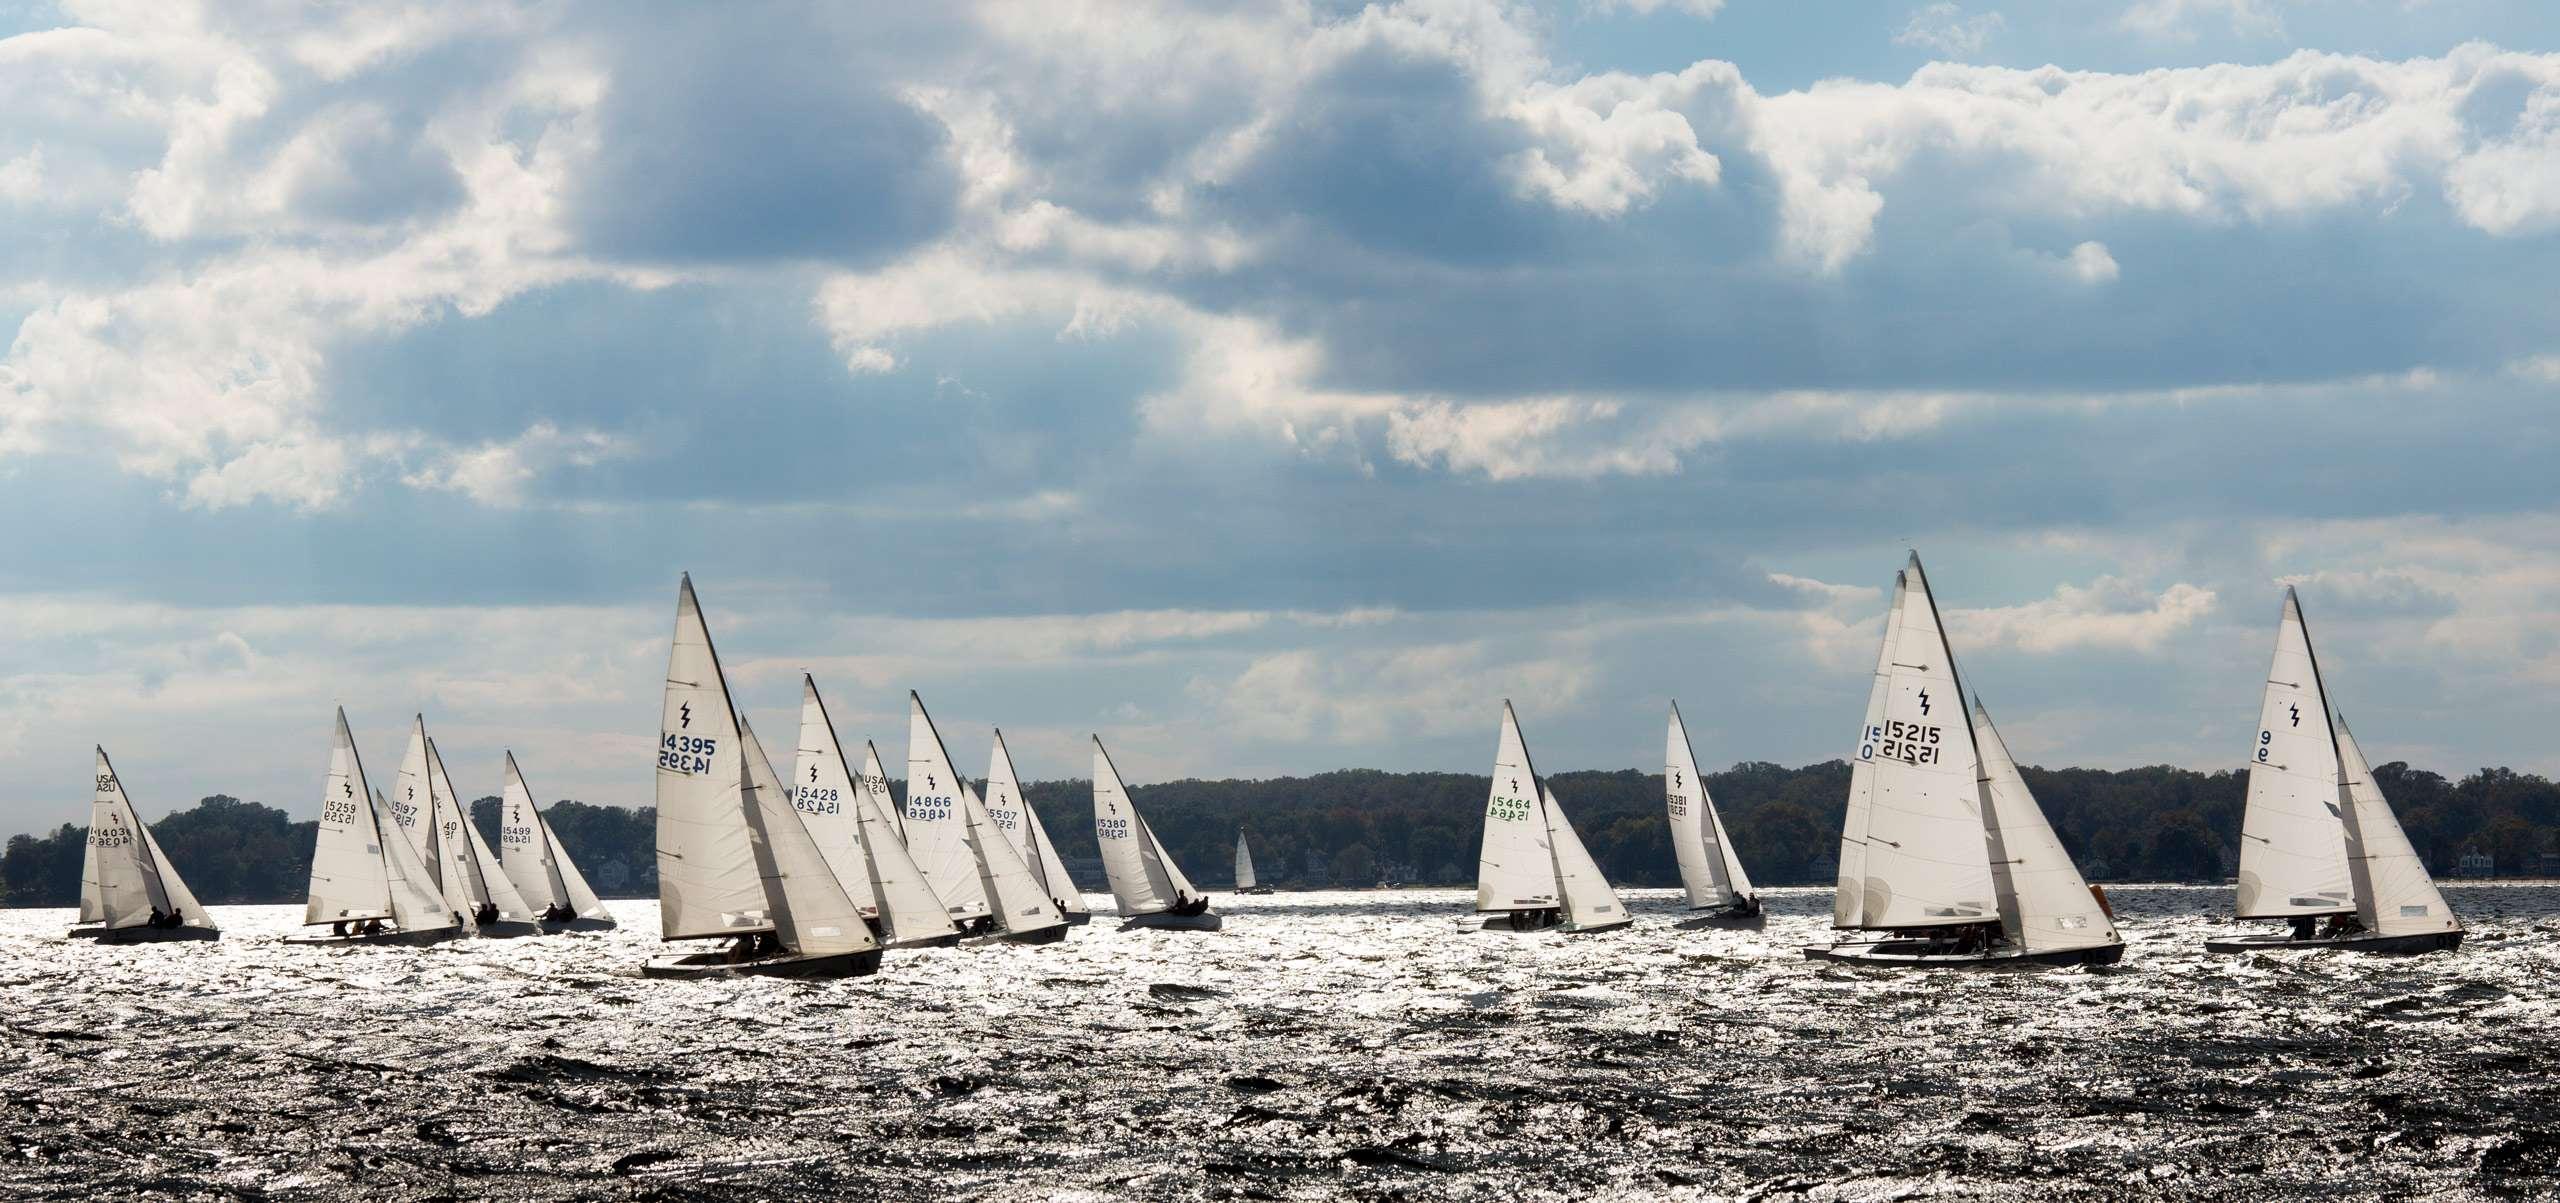 PORTFOLIO - Sailing - Chesapeake #4   PCG750